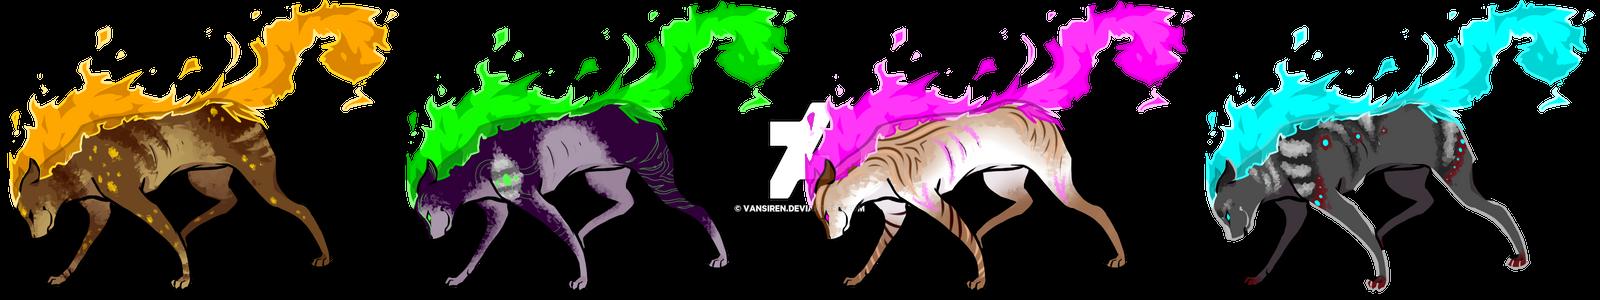 Flarecat Adopts Batch 1 (2/4 OPEN) by vansiren